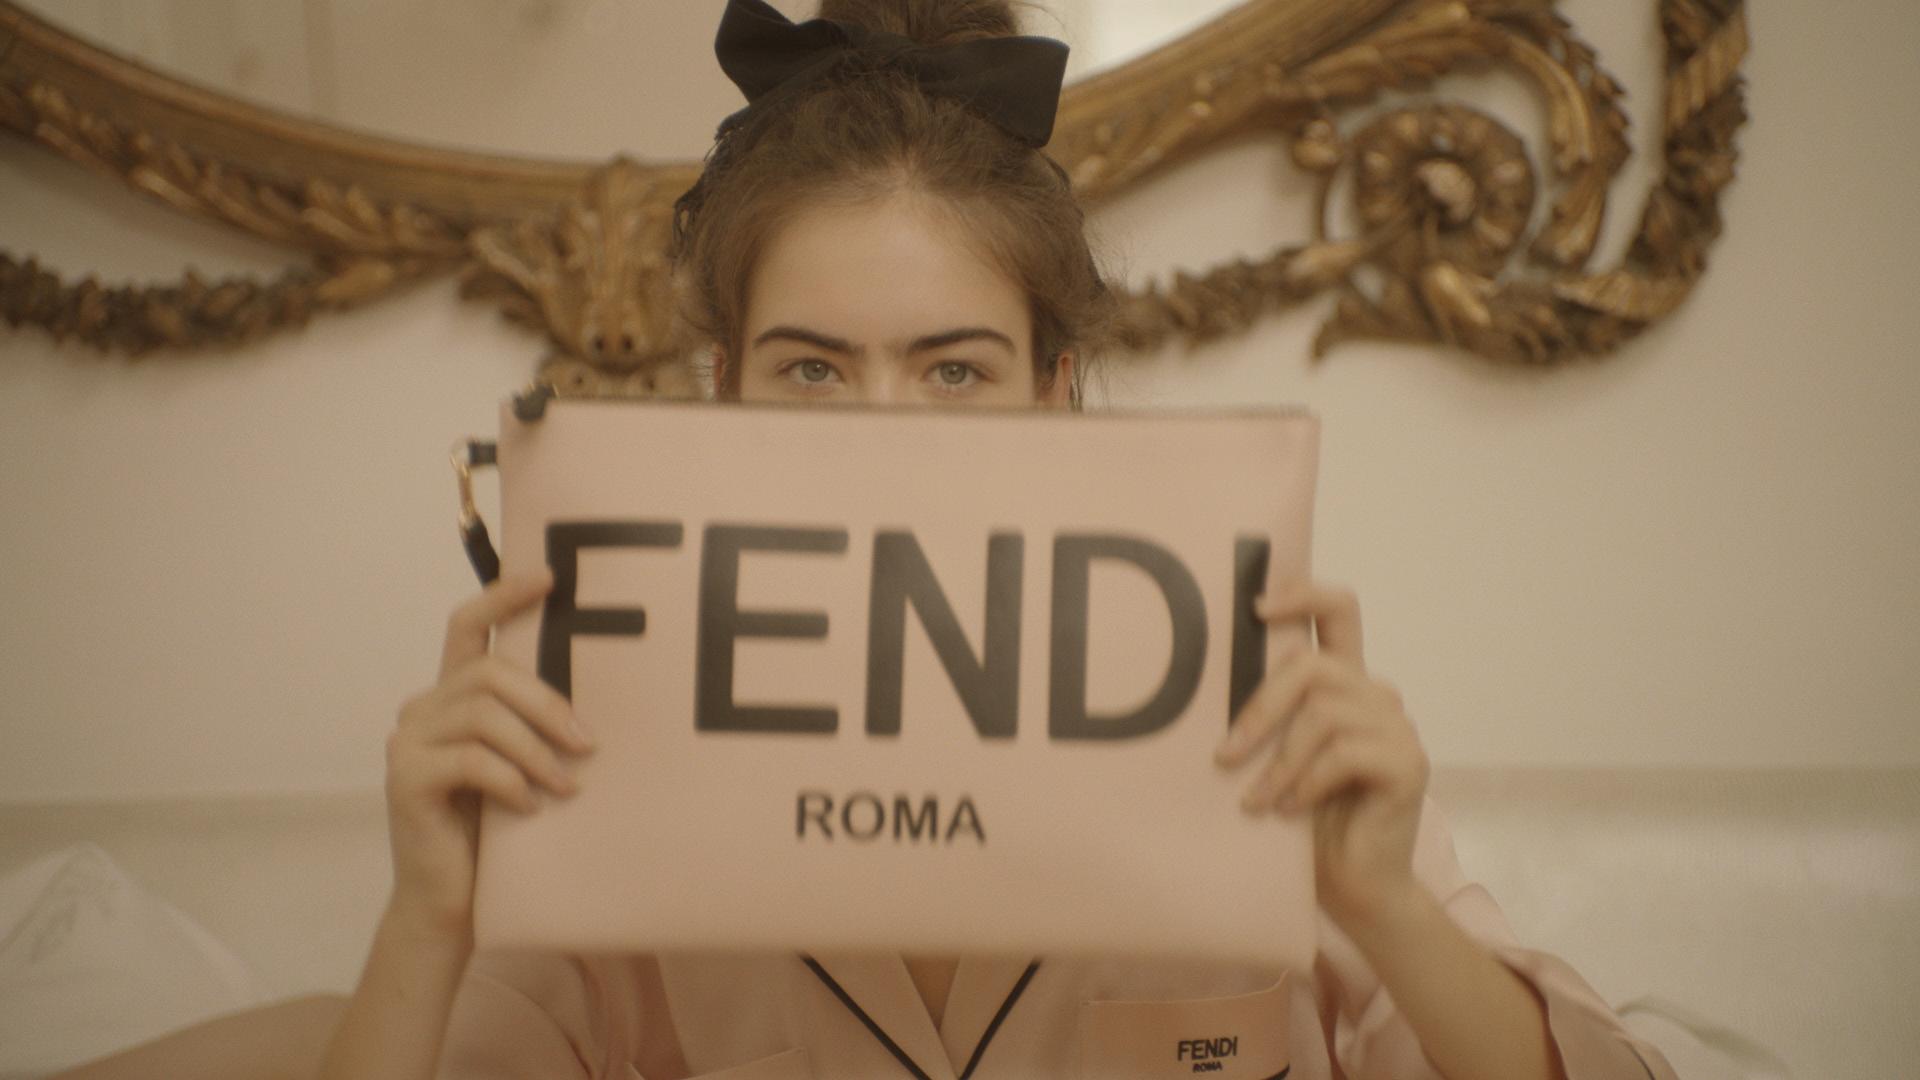 Colección Fendi Roma Holiday/Foto: Fendi.